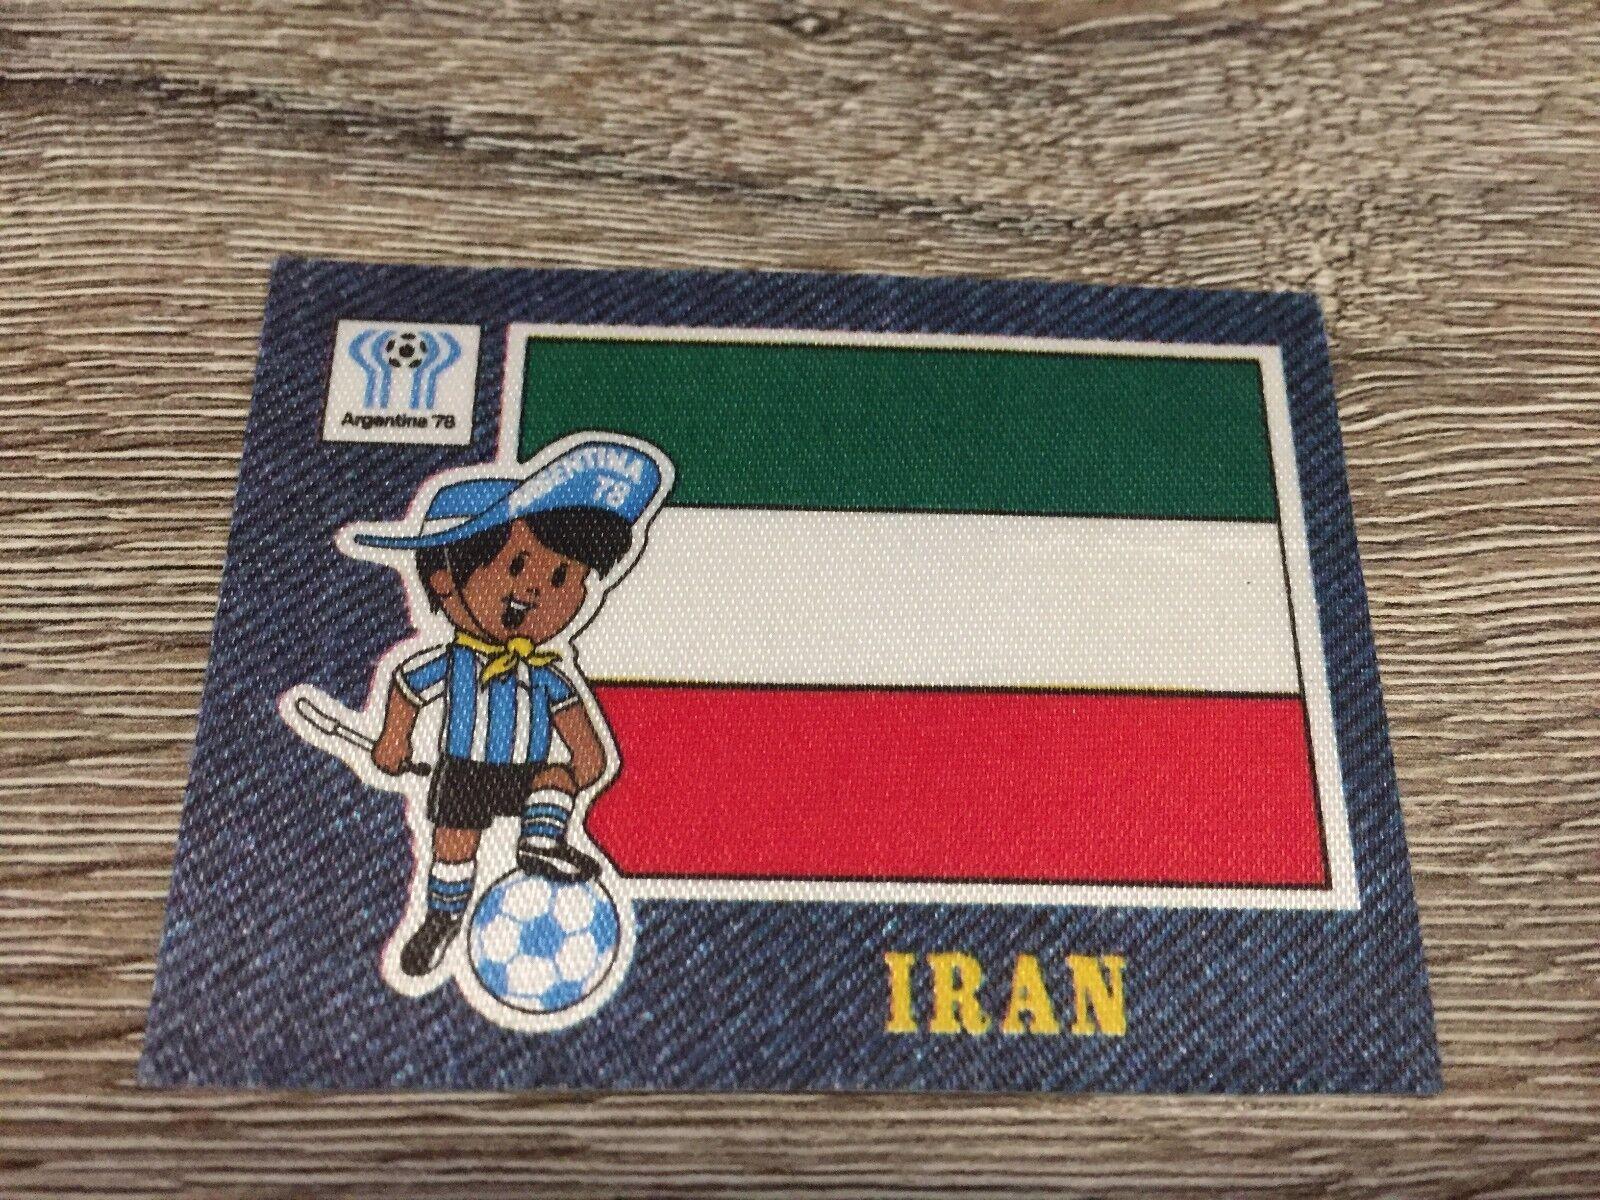 Panini Jean's Fussball 1978 - Sticker Argentina 78 - Iran